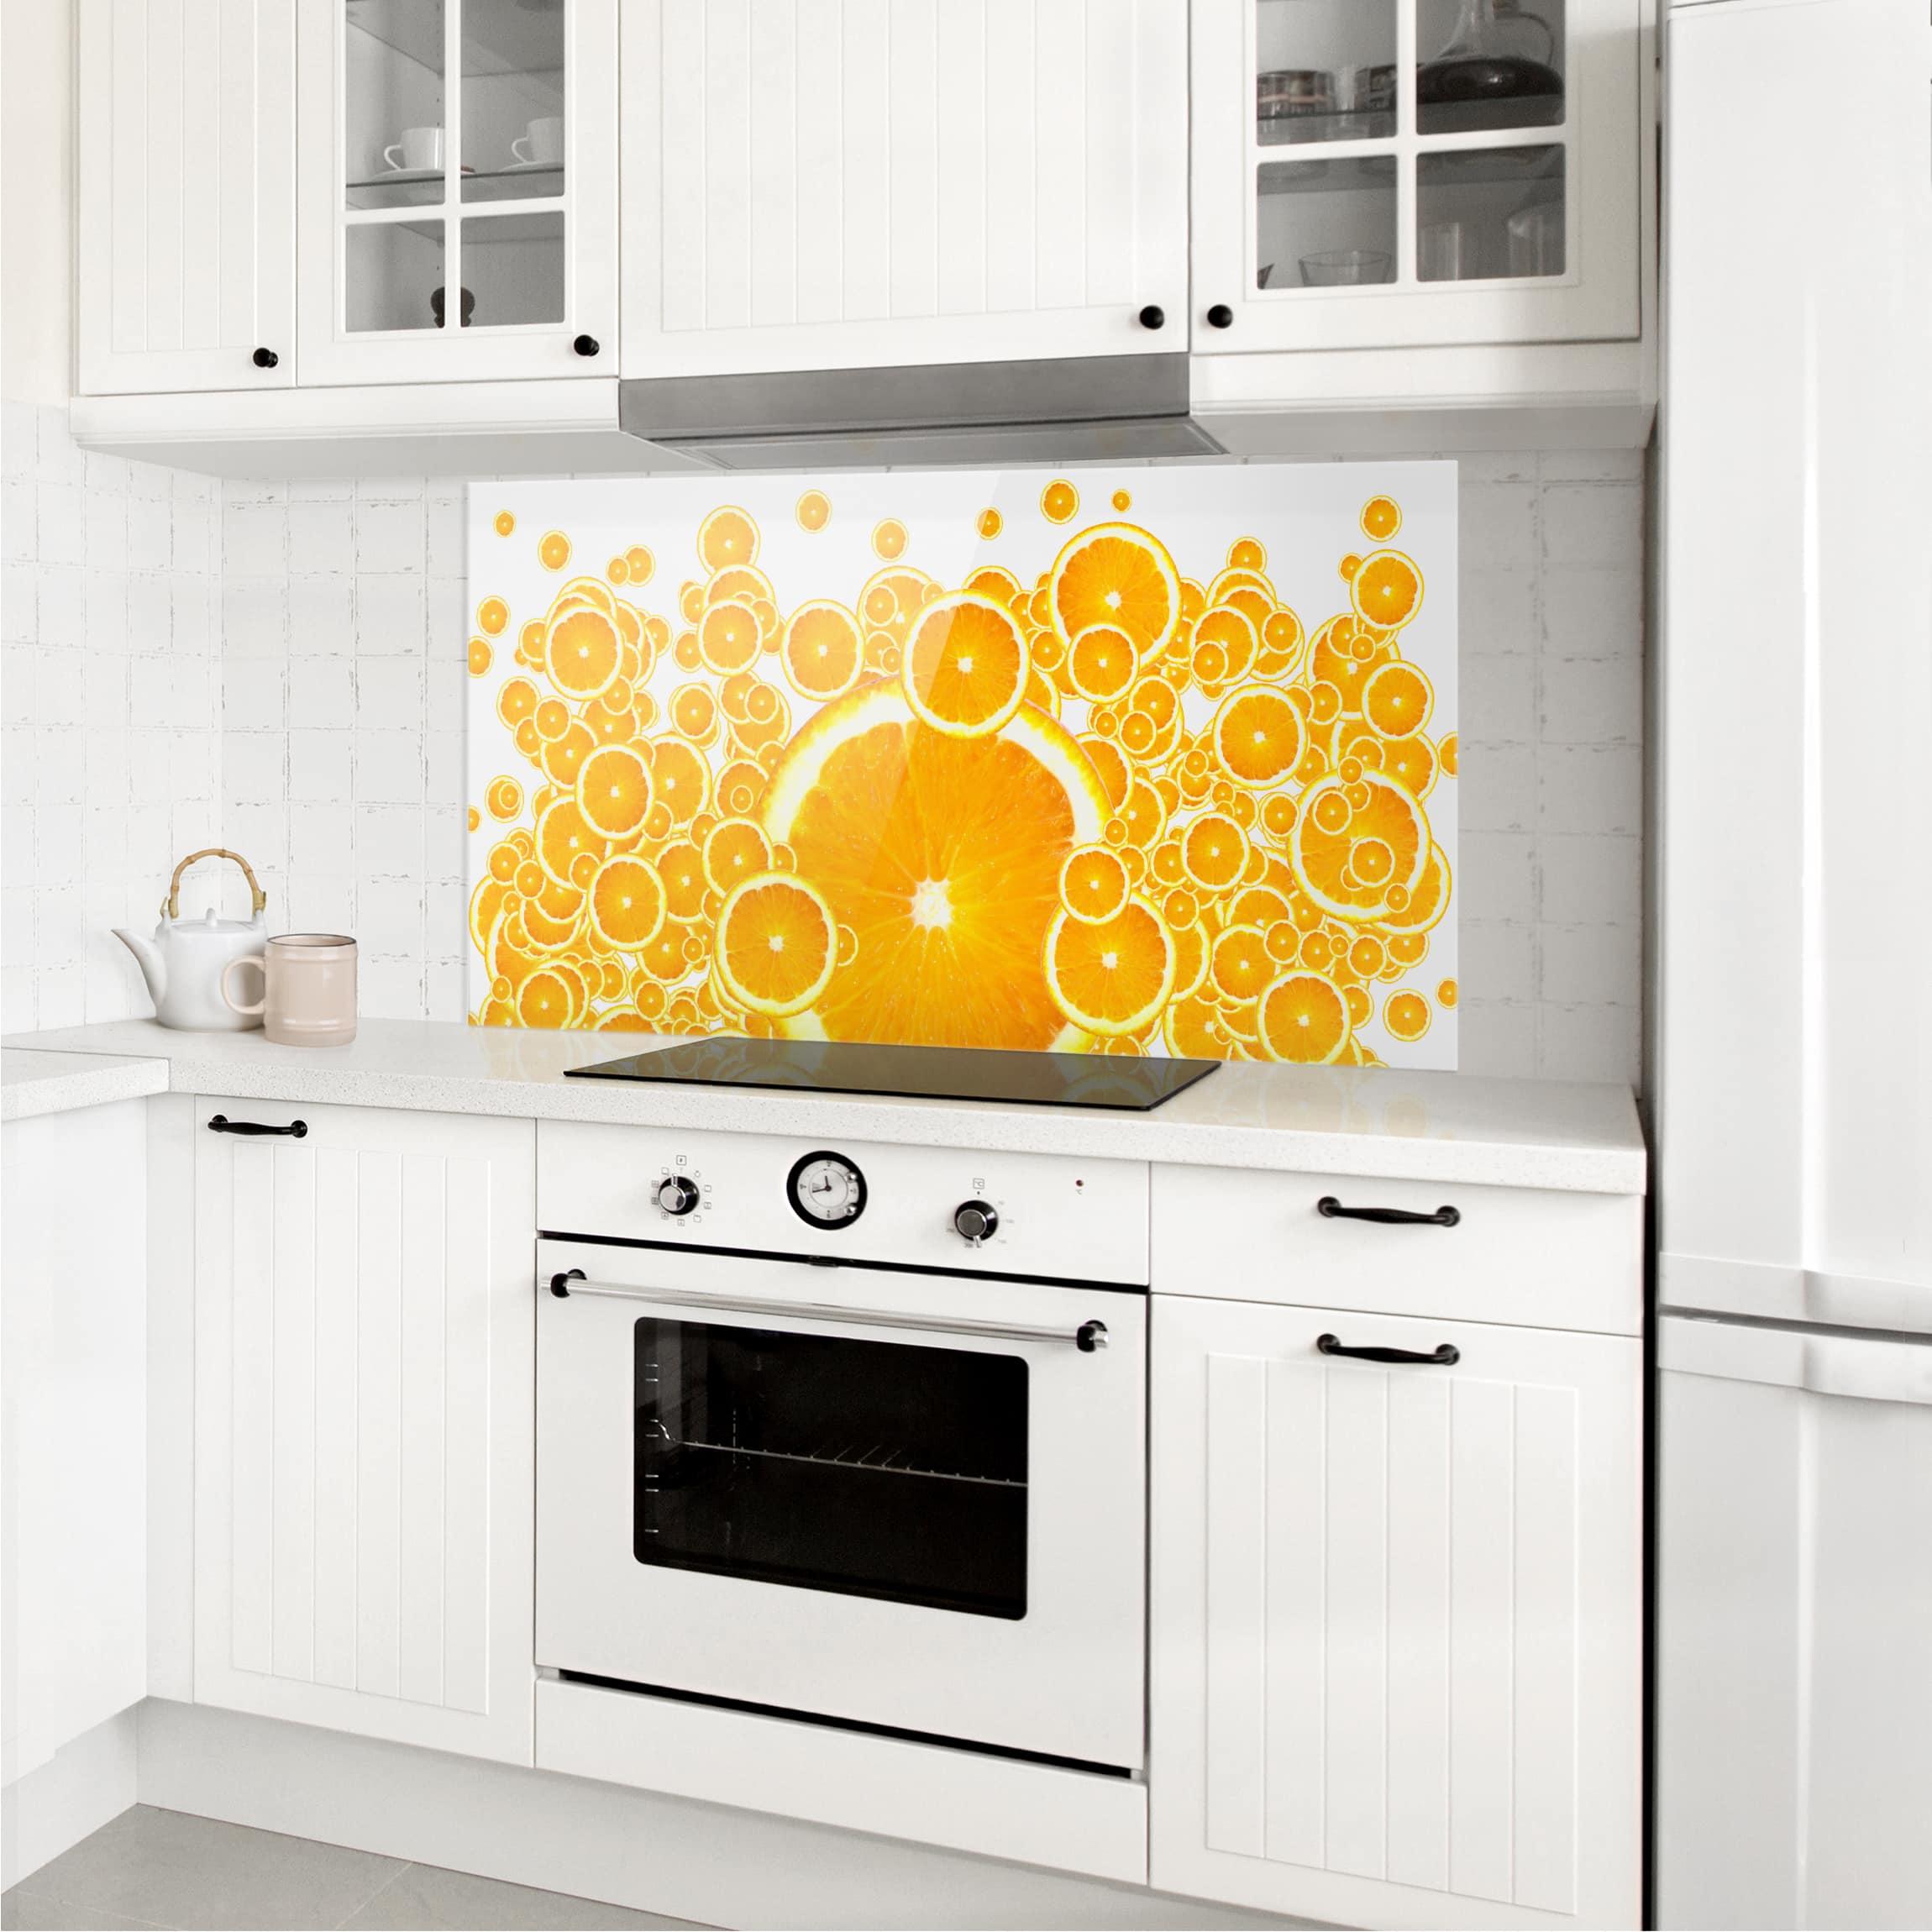 spritzschutz glas retro orange pattern quer 1 2. Black Bedroom Furniture Sets. Home Design Ideas